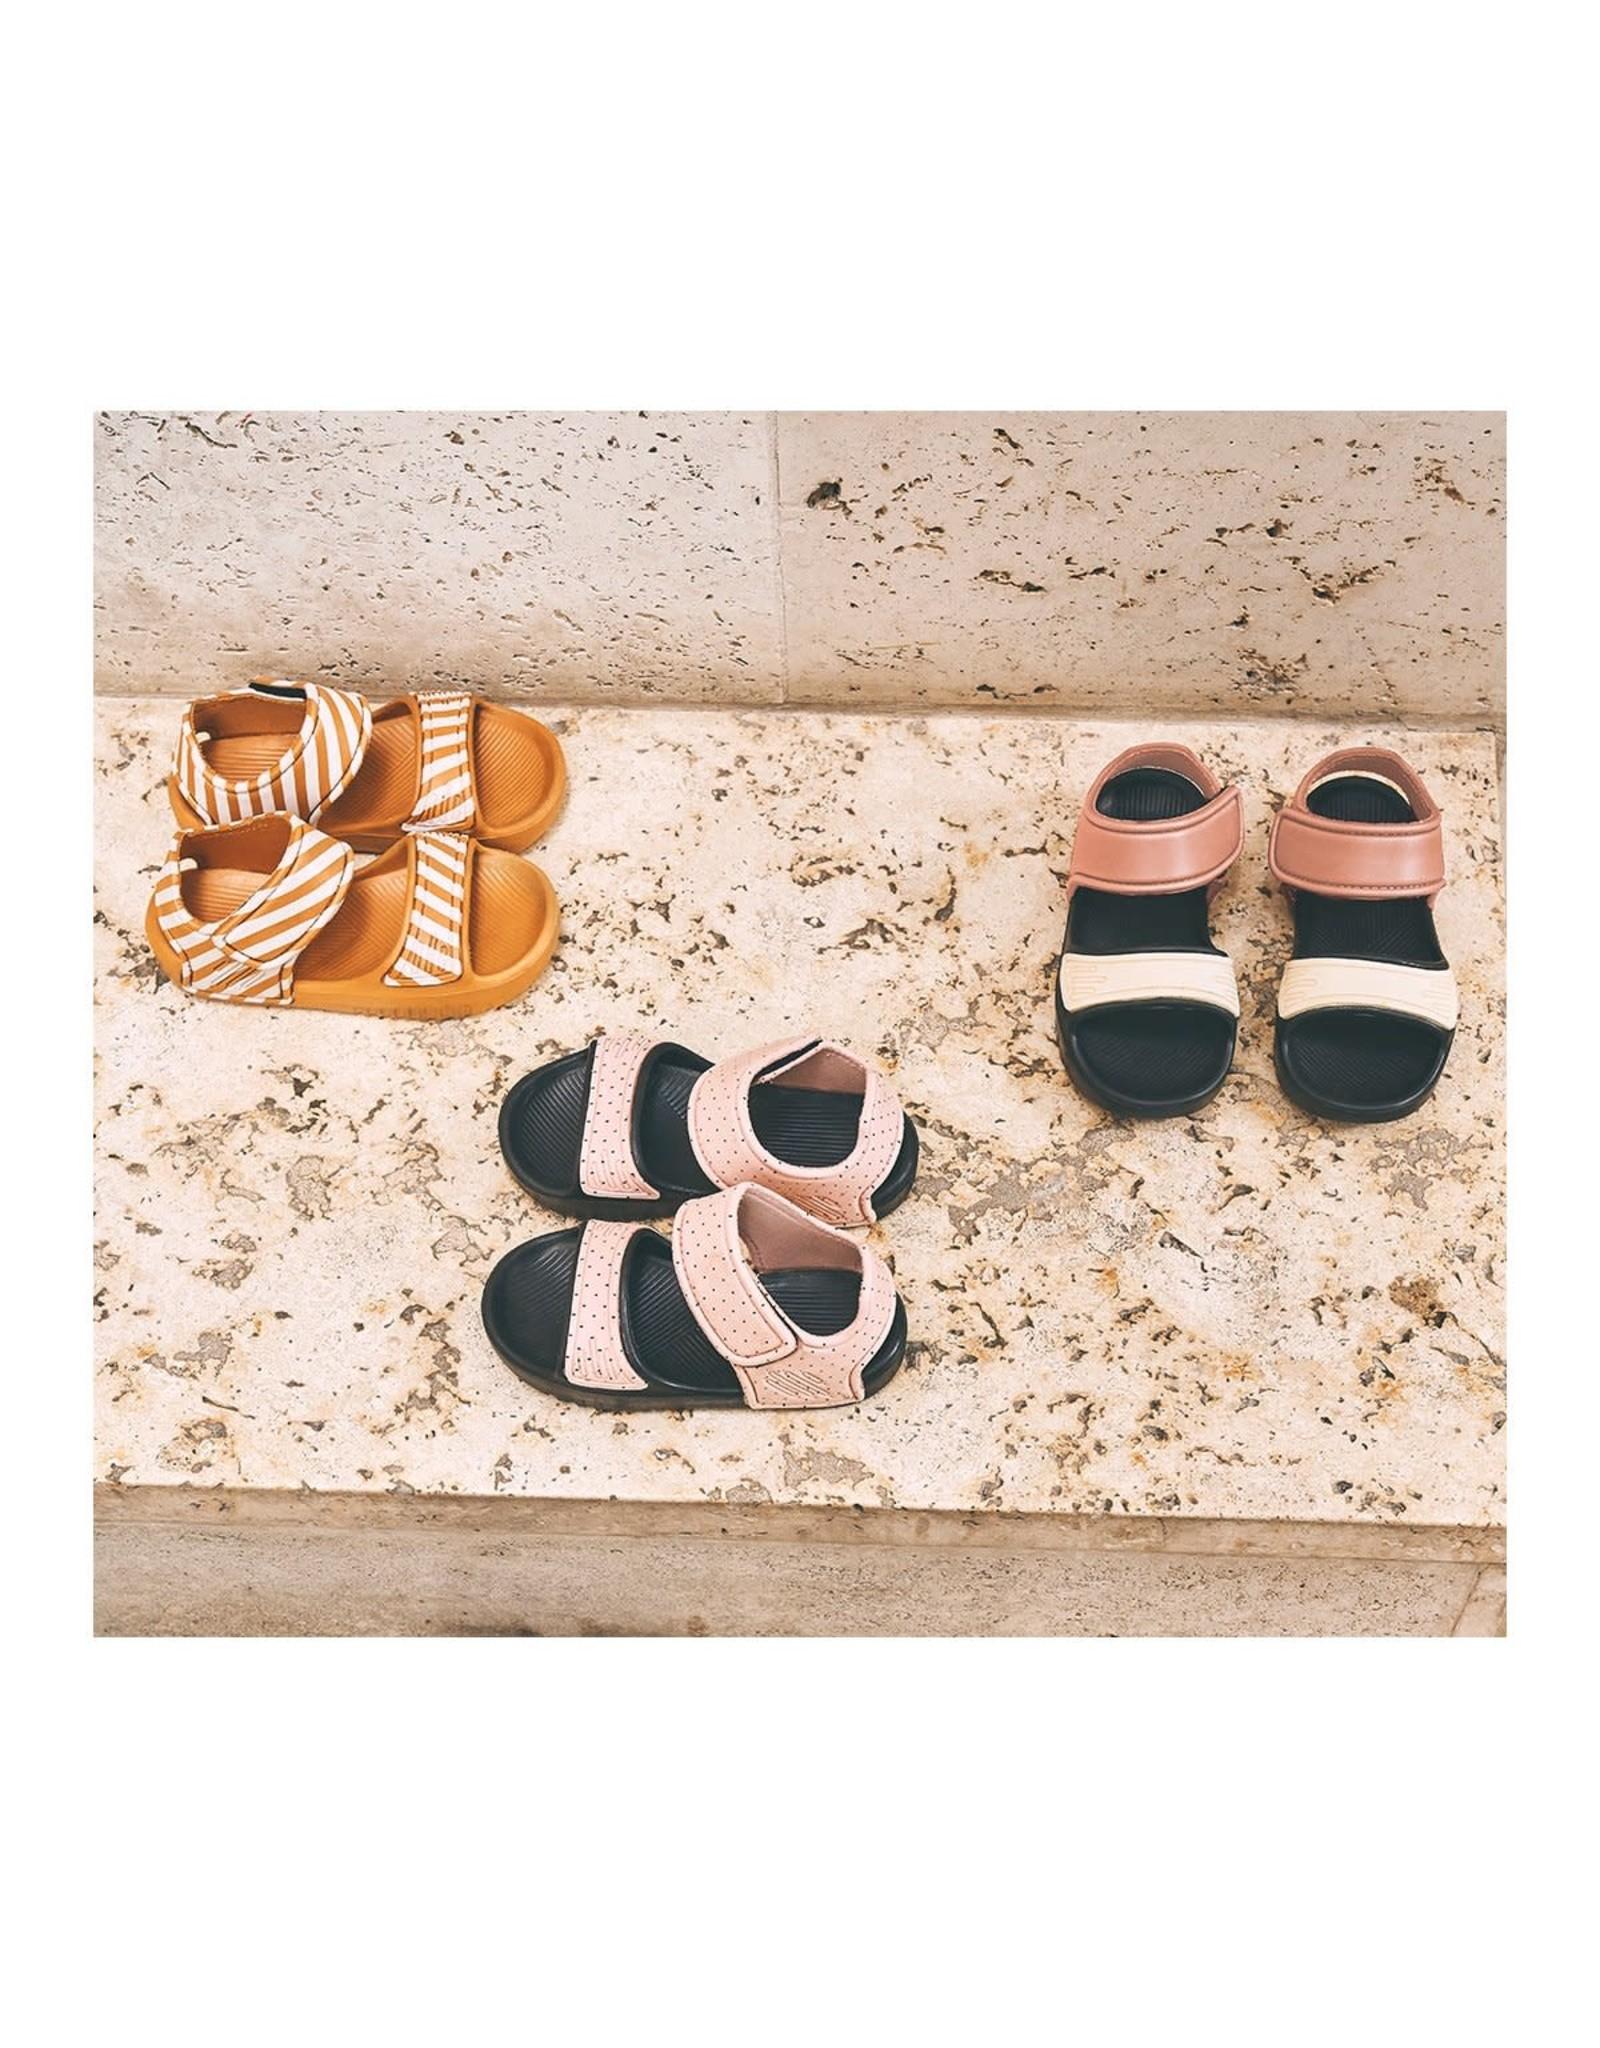 Liewood Liewood Blumer sandals stripe mustard/creme de la creme